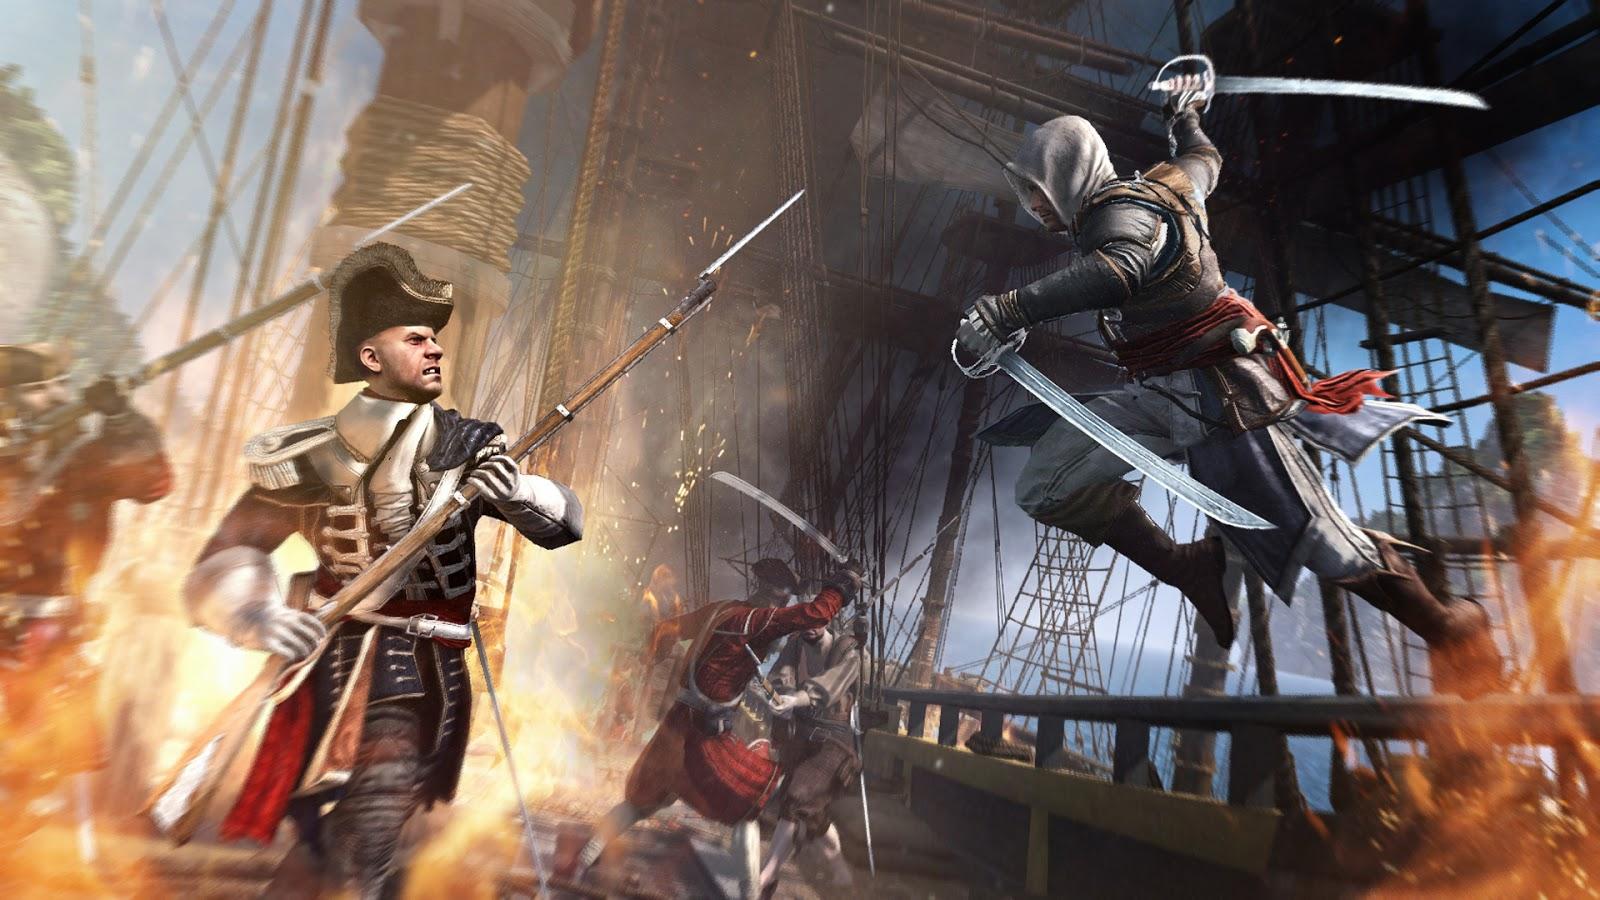 Free Game 4u Assassin S Creed Iv Black Flag File Size 5 30gb